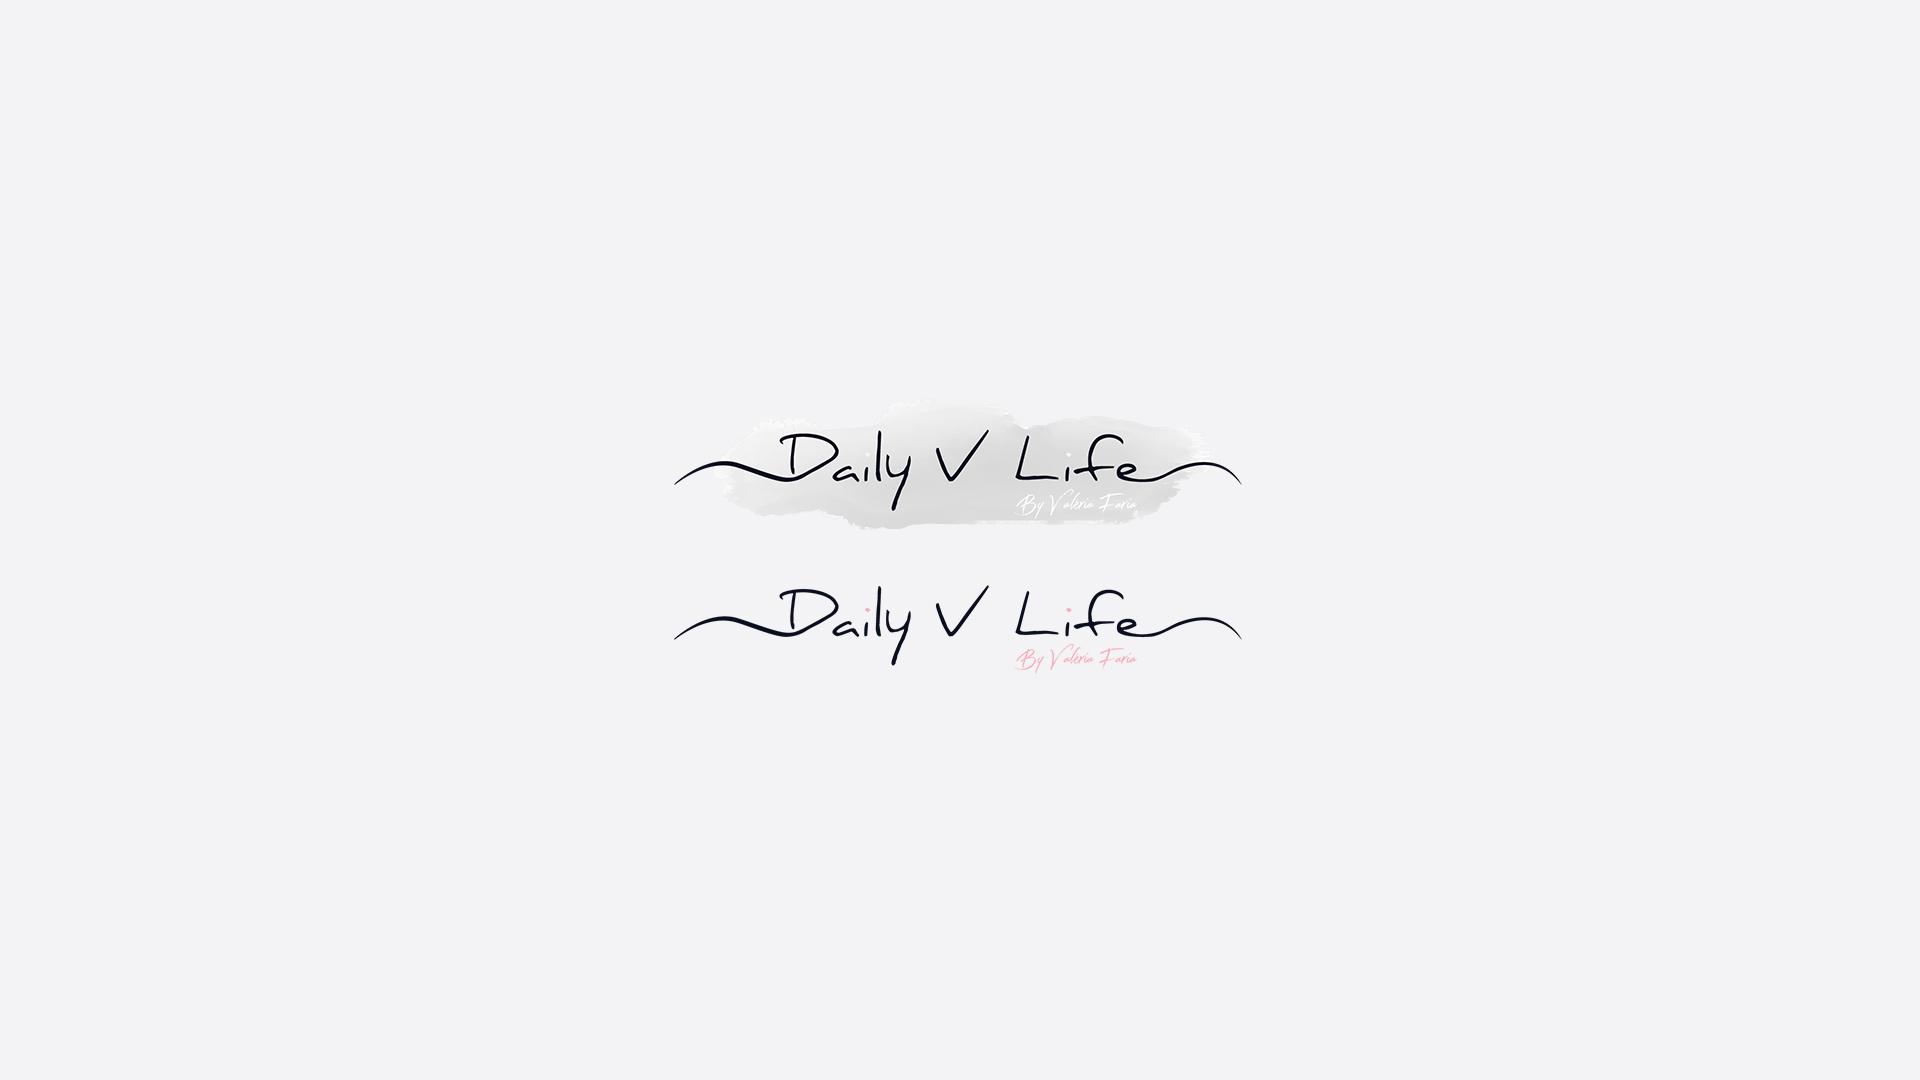 Daily V Life